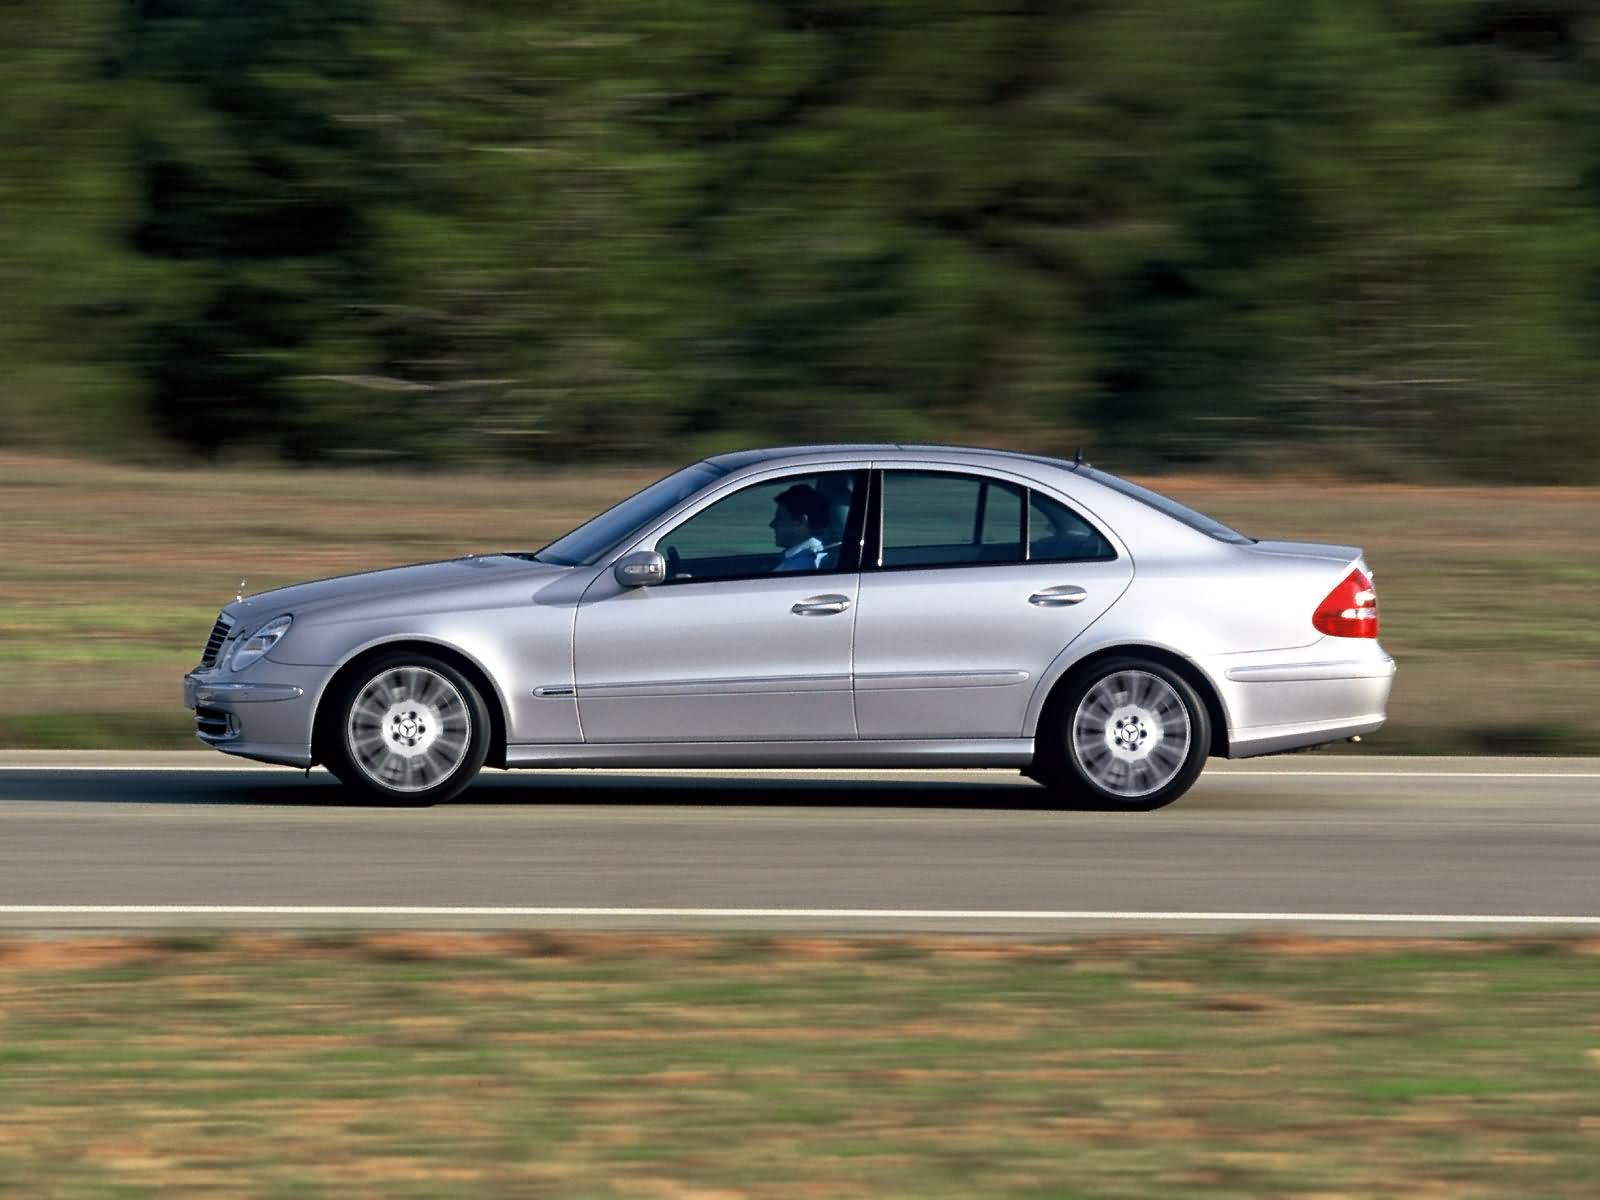 Mercedes benz e class w211 picture 17096 mercedes benz for Mercedes benz w211